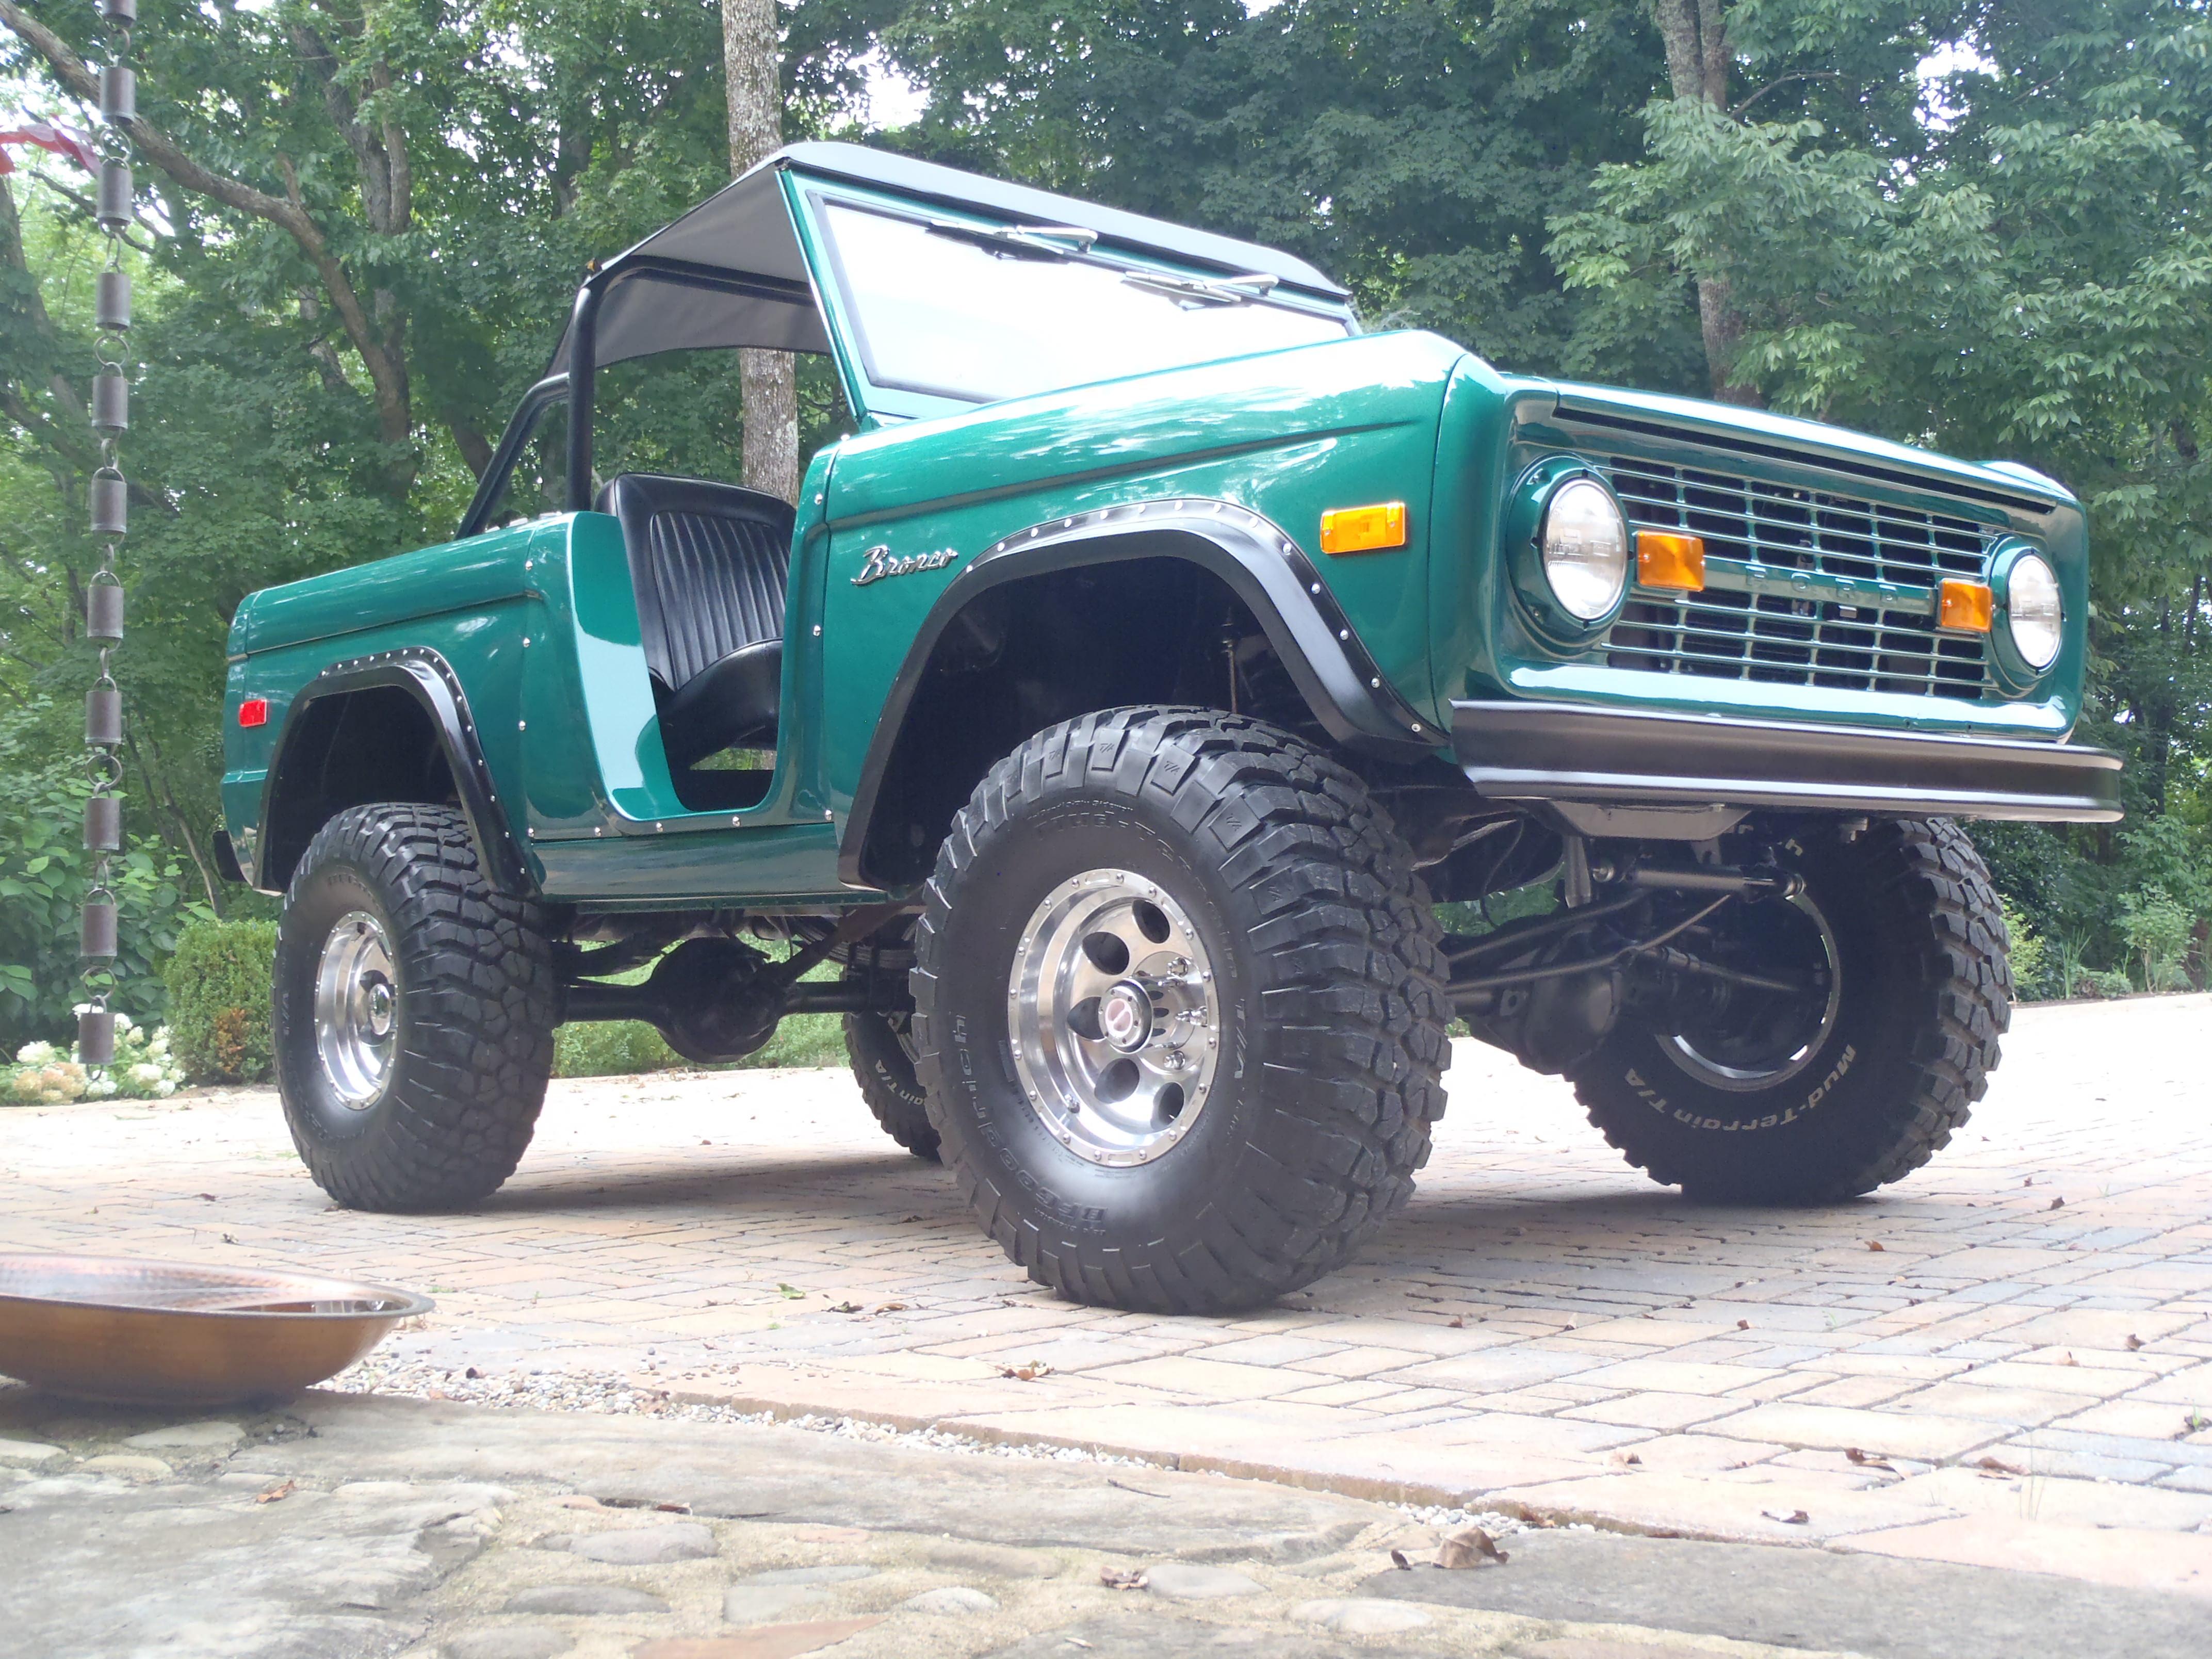 Custom Early Bronco by Krawlers Edge